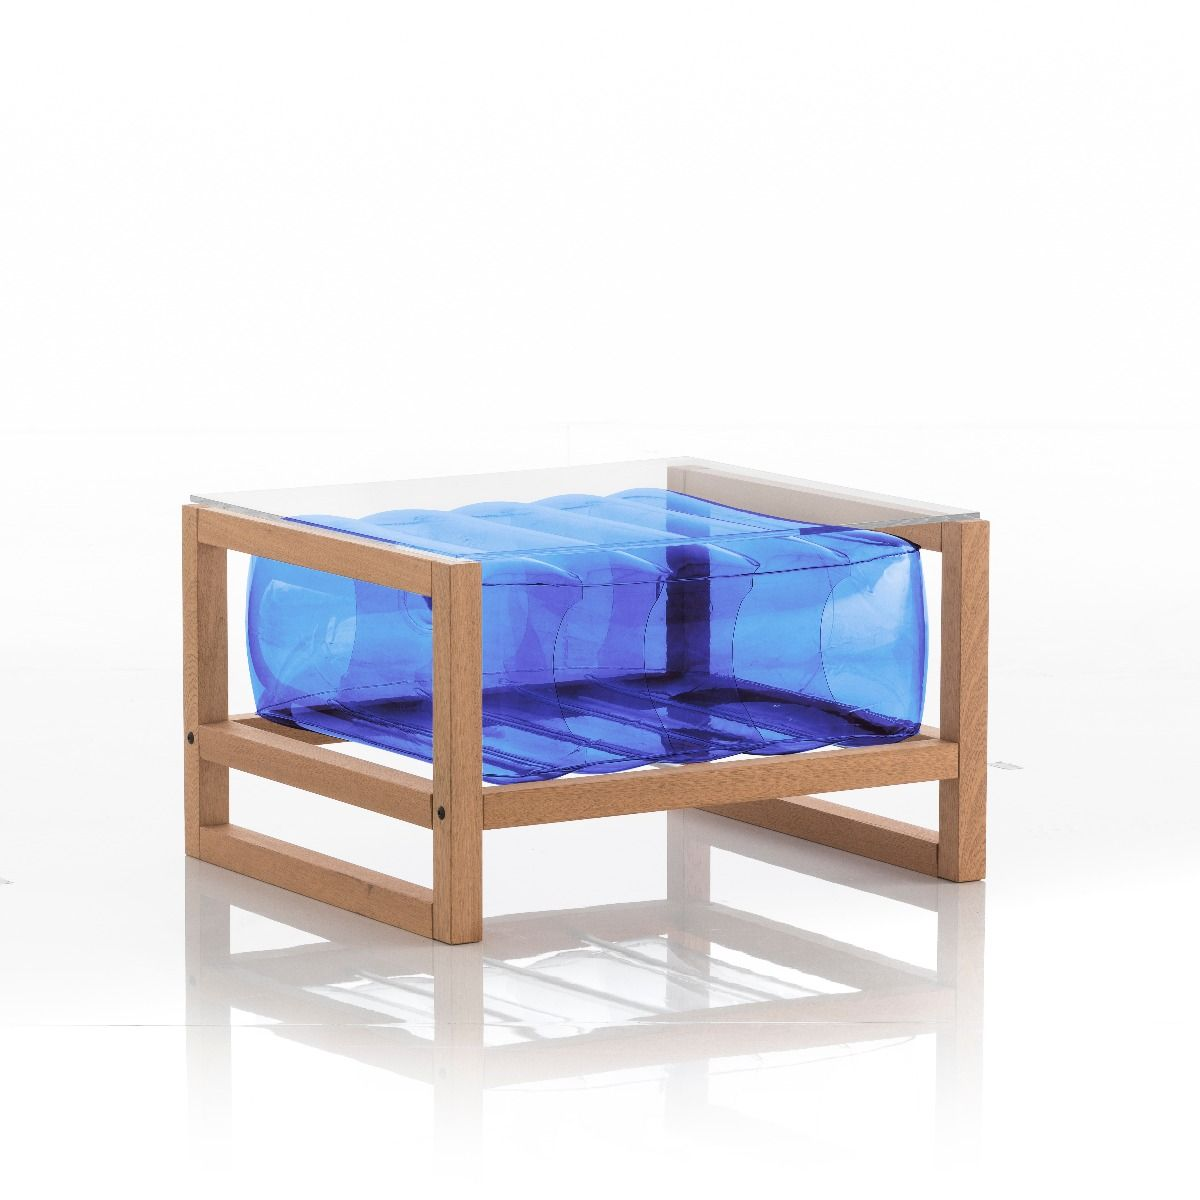 Table basse en bois et tpu bleu